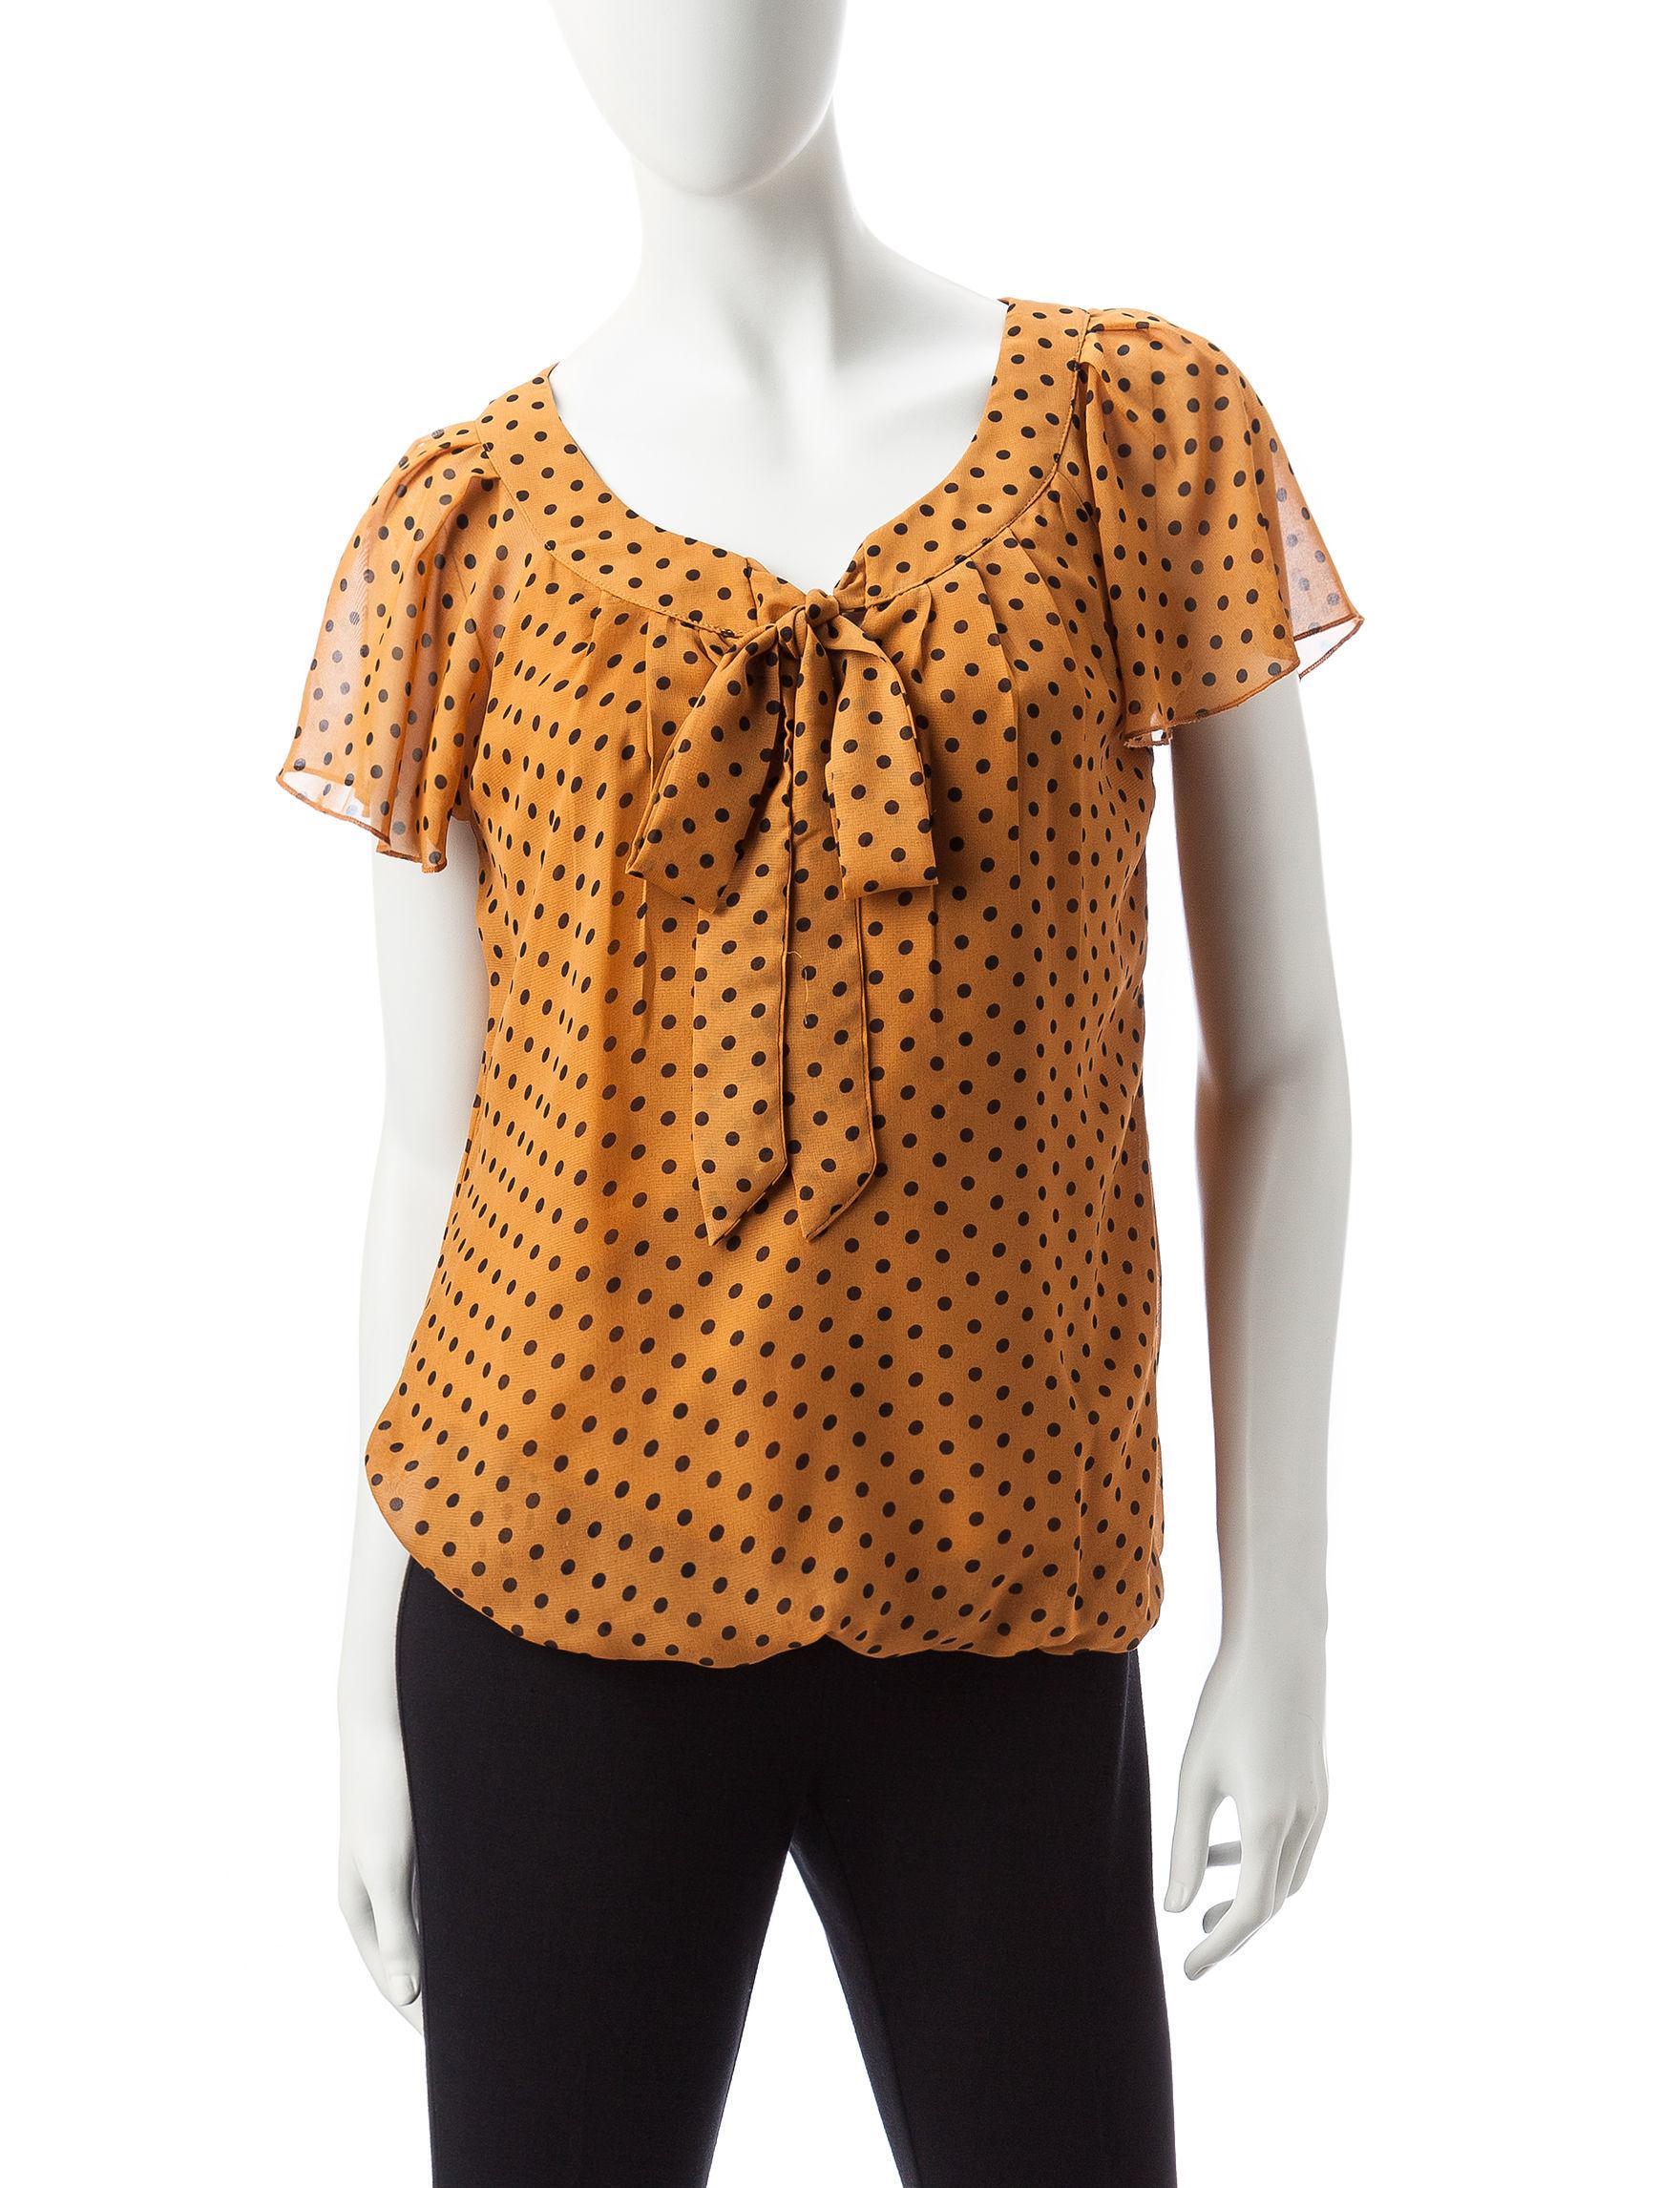 Sara Michelle Brown / Black Shirts & Blouses